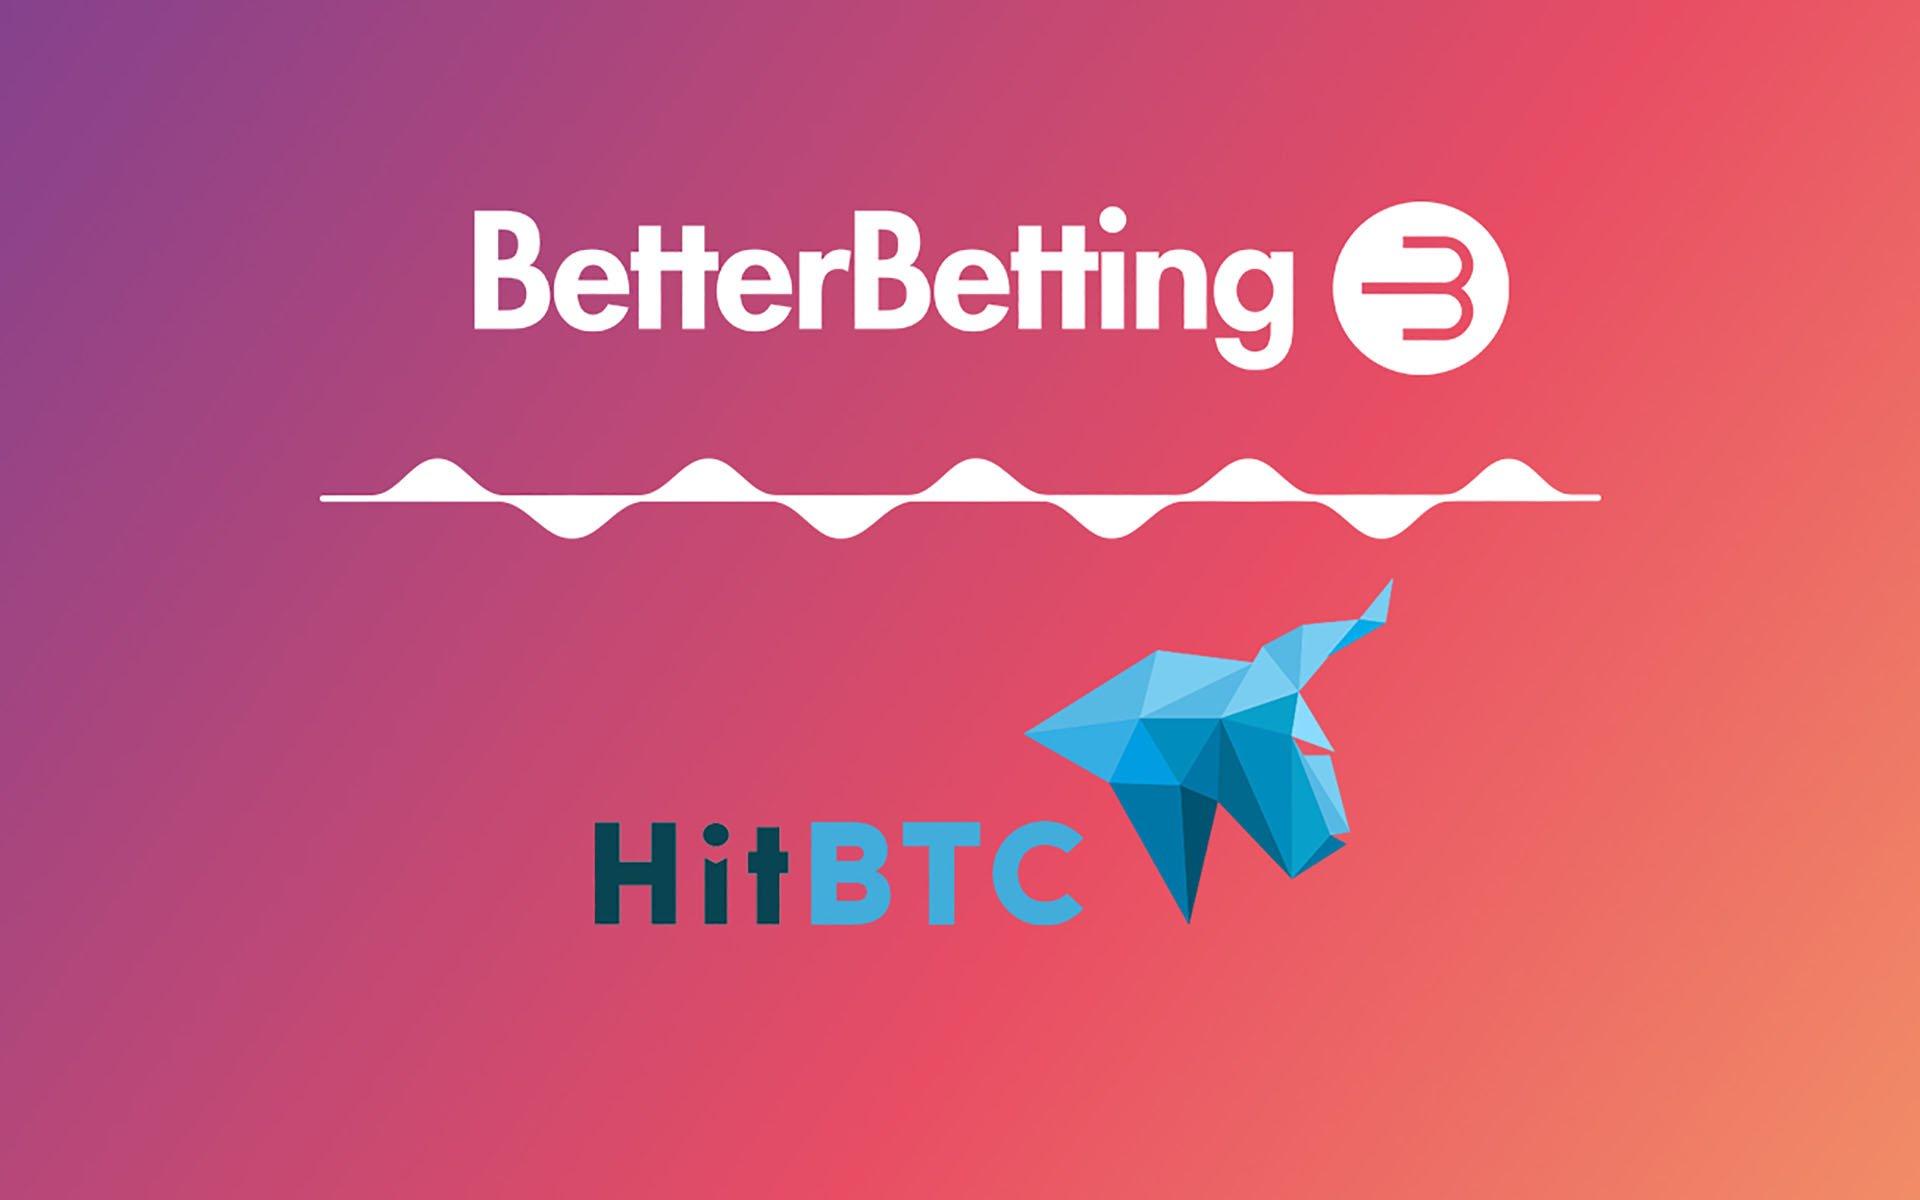 P2P Sports Betting Platform BetterBetting Announces HitBTC Listing